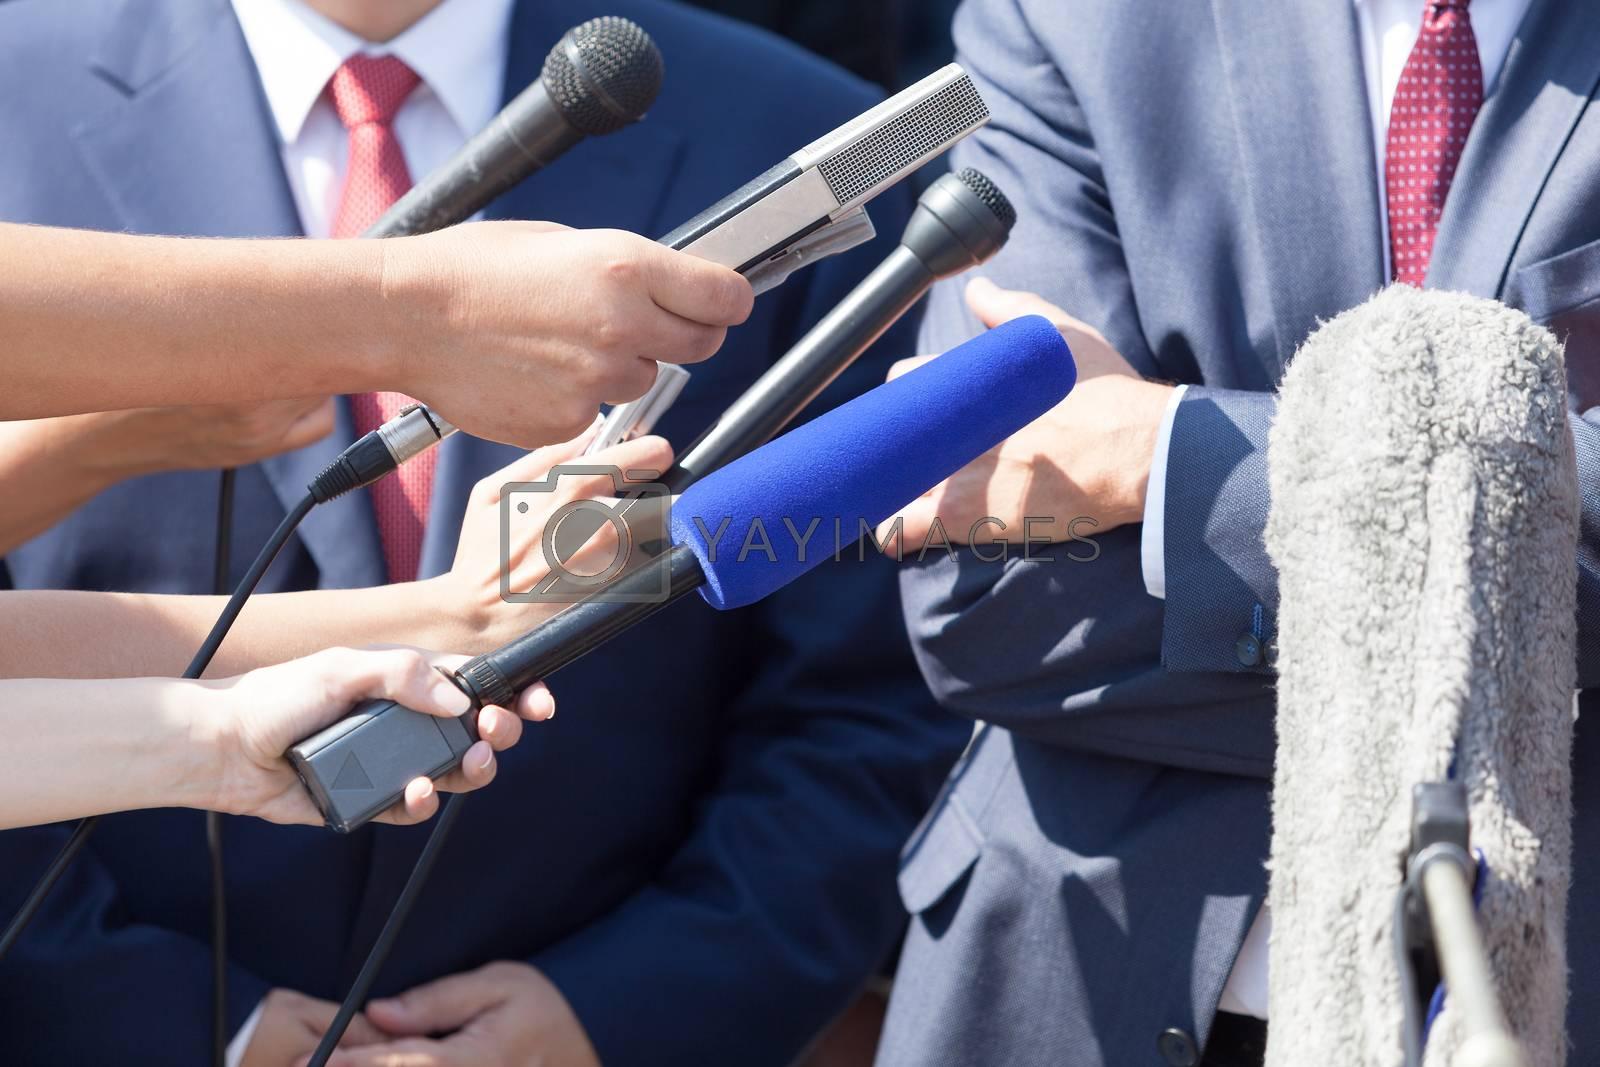 Media interview with businessperson, politician or spokesman